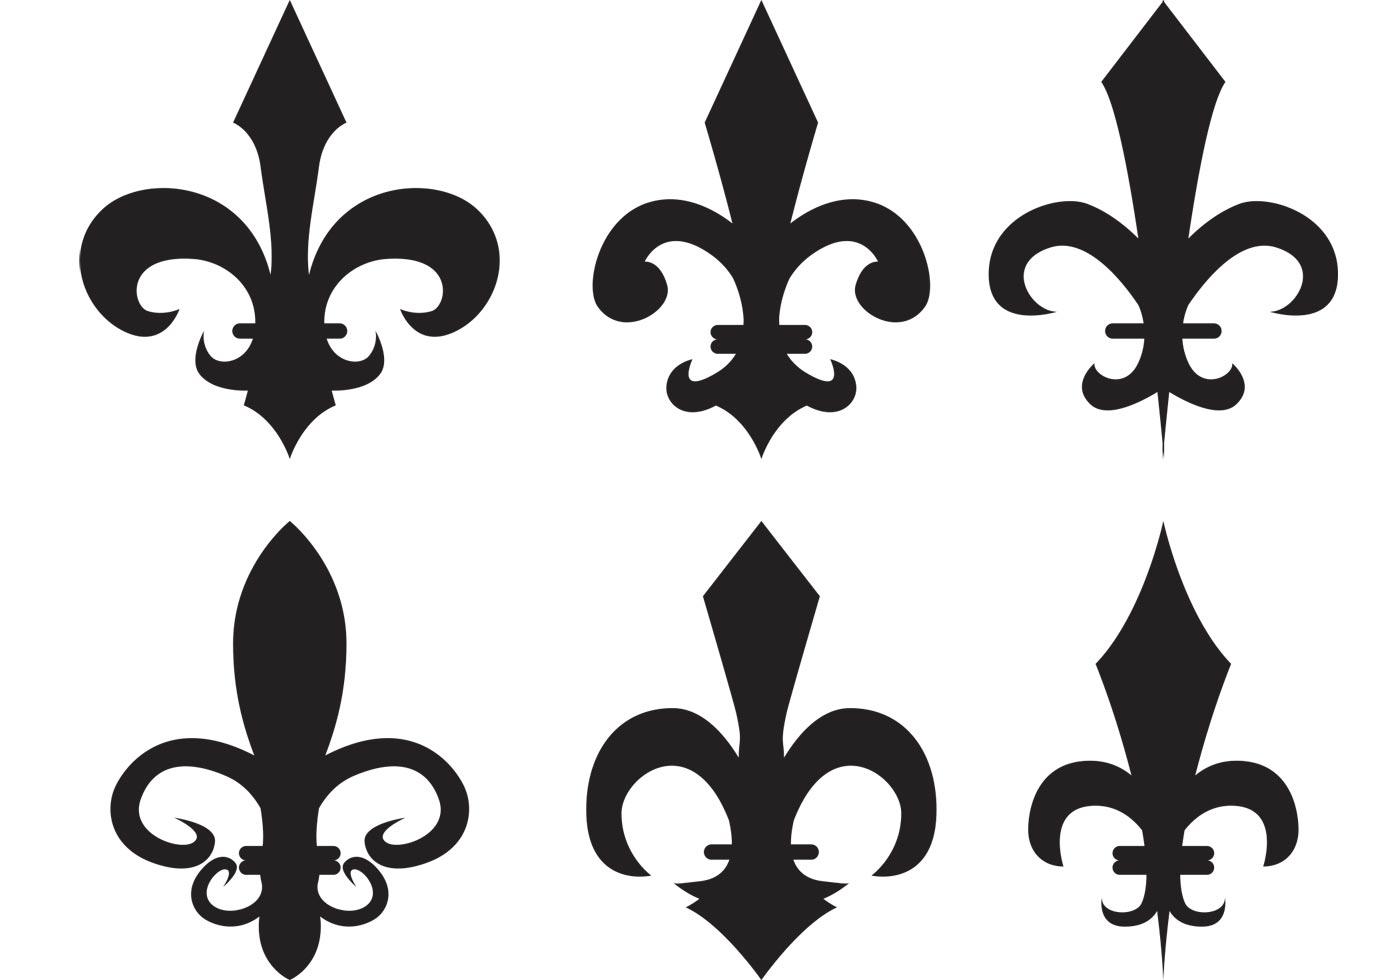 fleur de lis vector silhouettes download free vector art stock graphics images. Black Bedroom Furniture Sets. Home Design Ideas